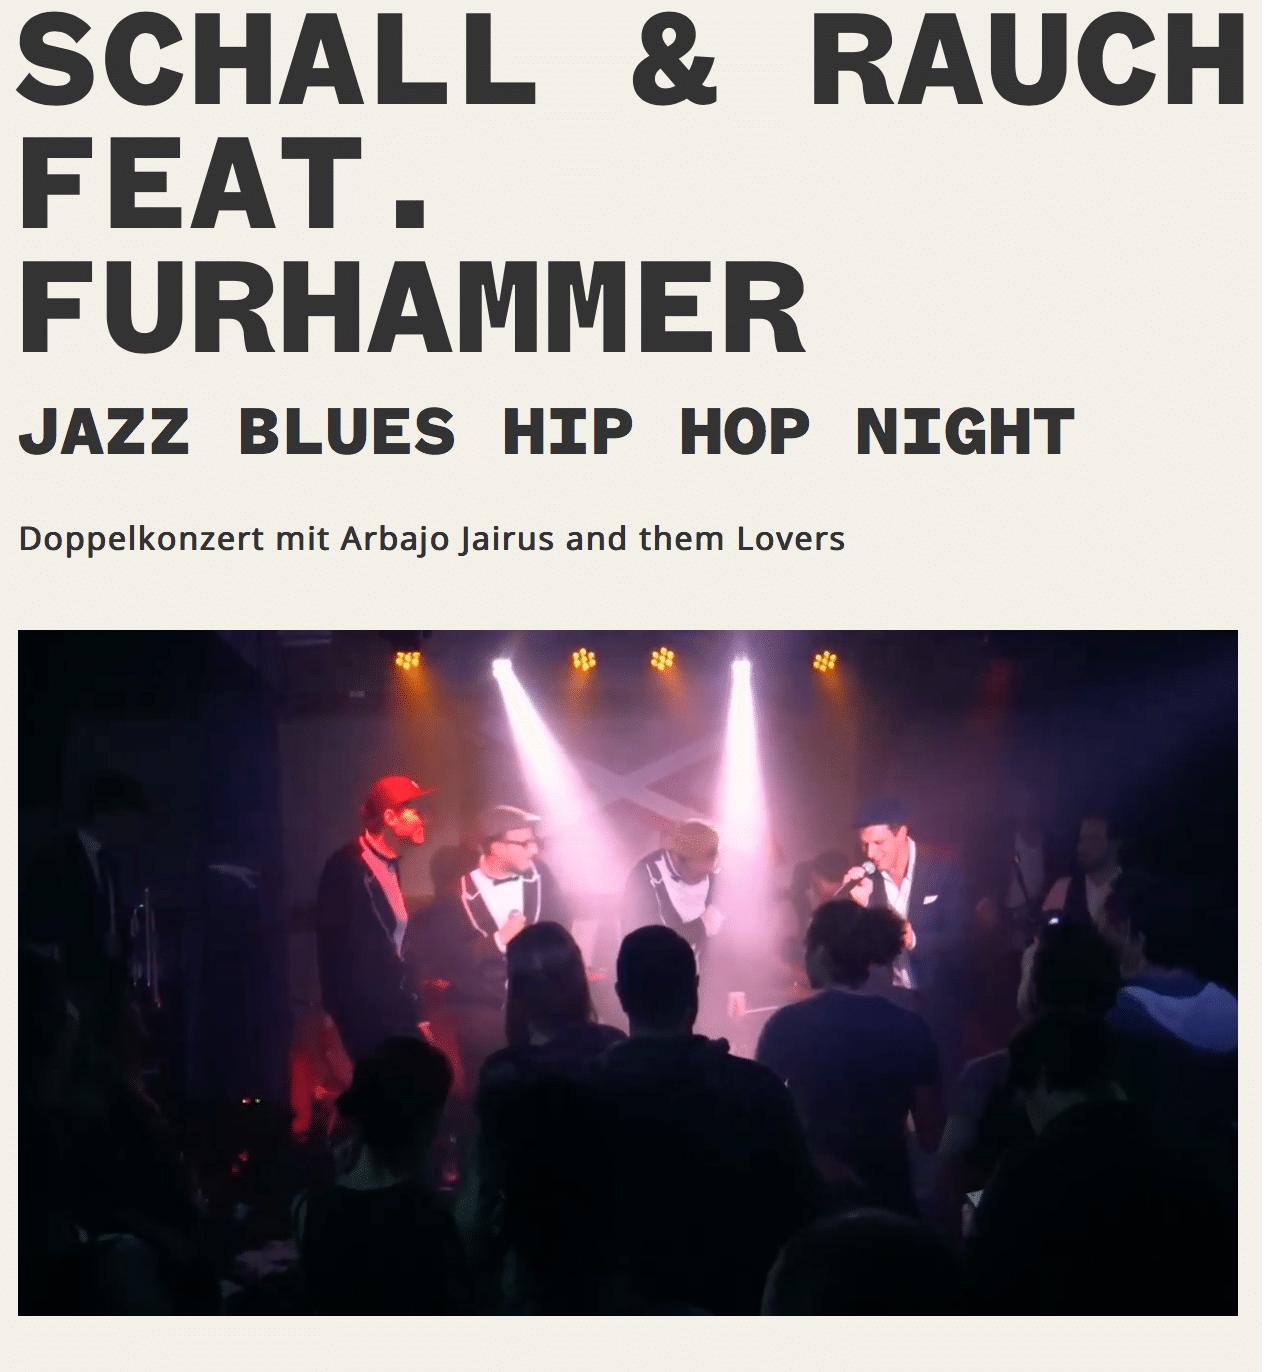 mehrspur_furhammer_2020_flyer